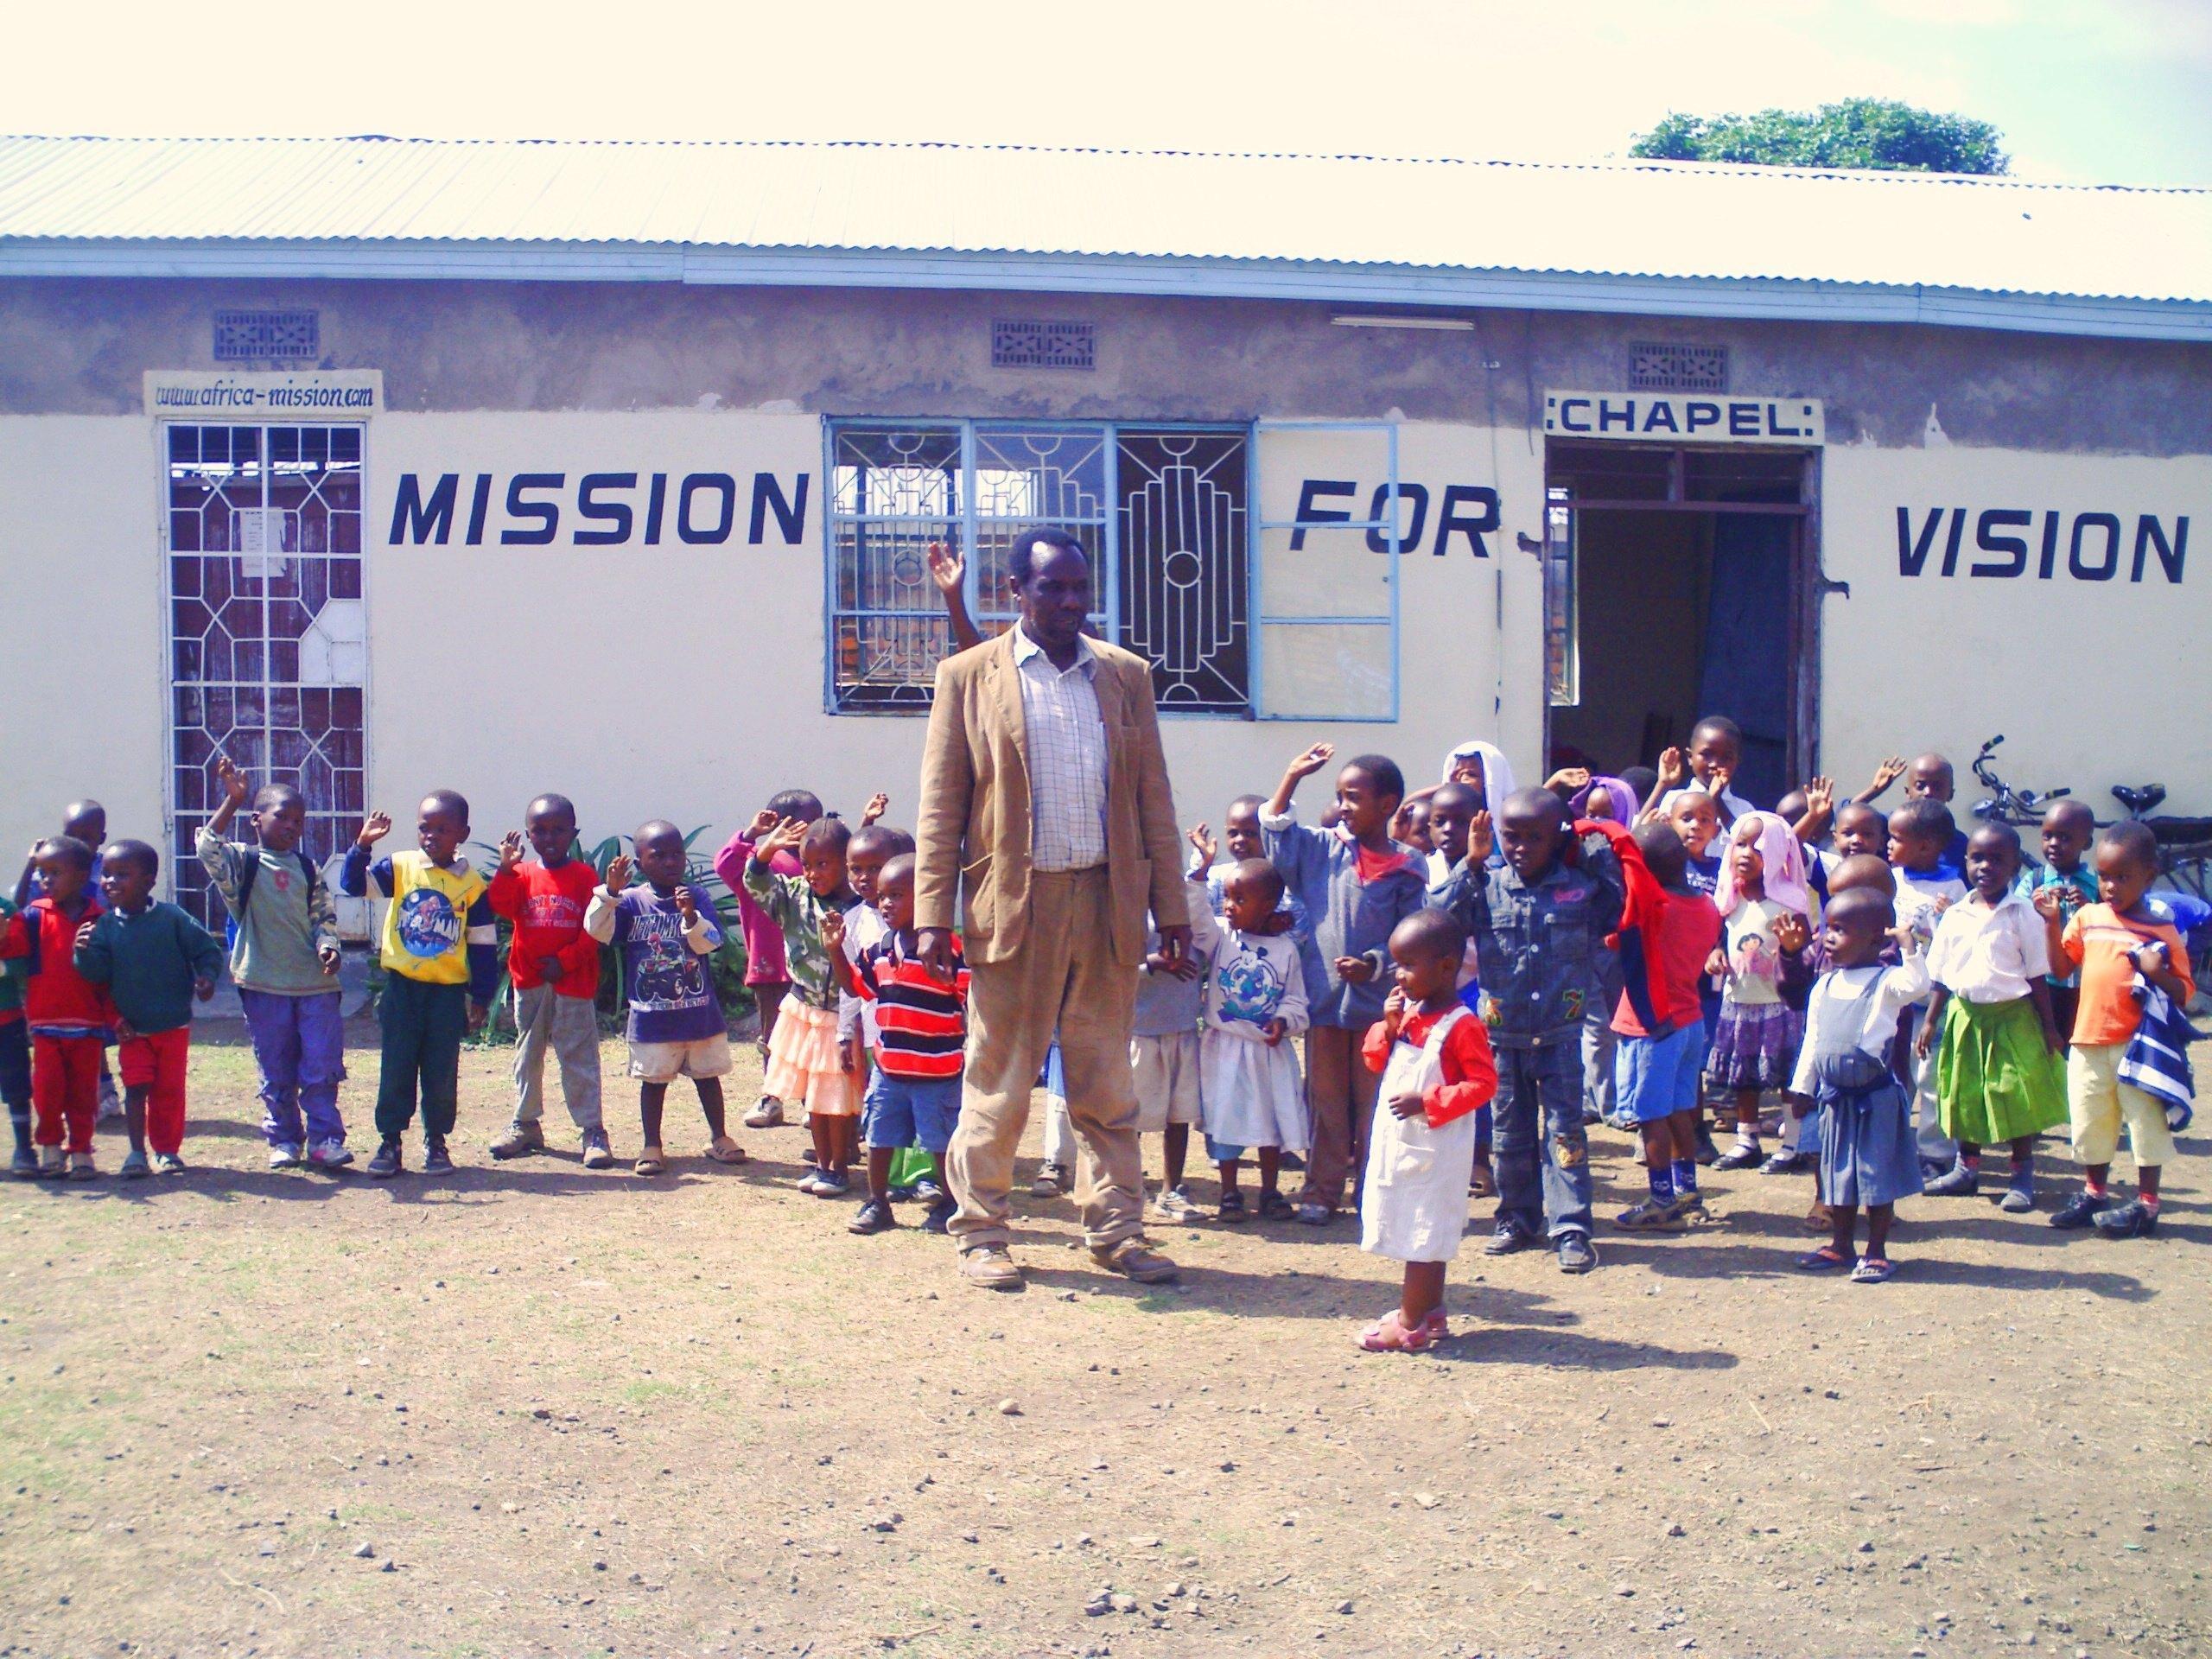 Mission For Vision